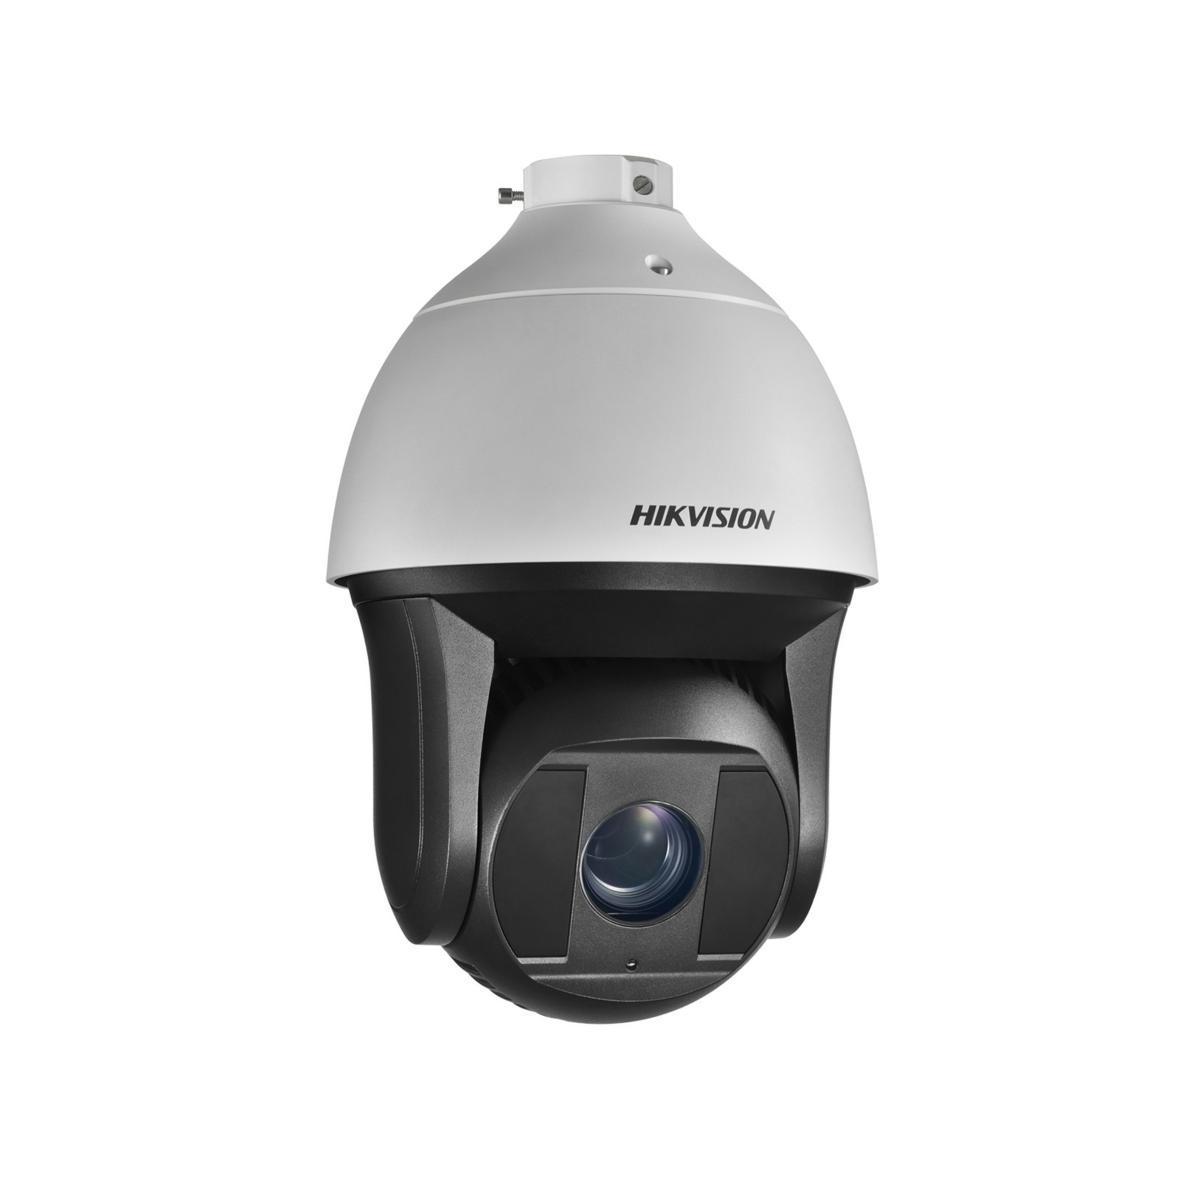 SICE Distributore Ufficiale  TELECAMERE IP Speeddome 3MP High FrameRate Smart PTZ Camera 36x 24VAC | DS-2DF8336IV-AEL